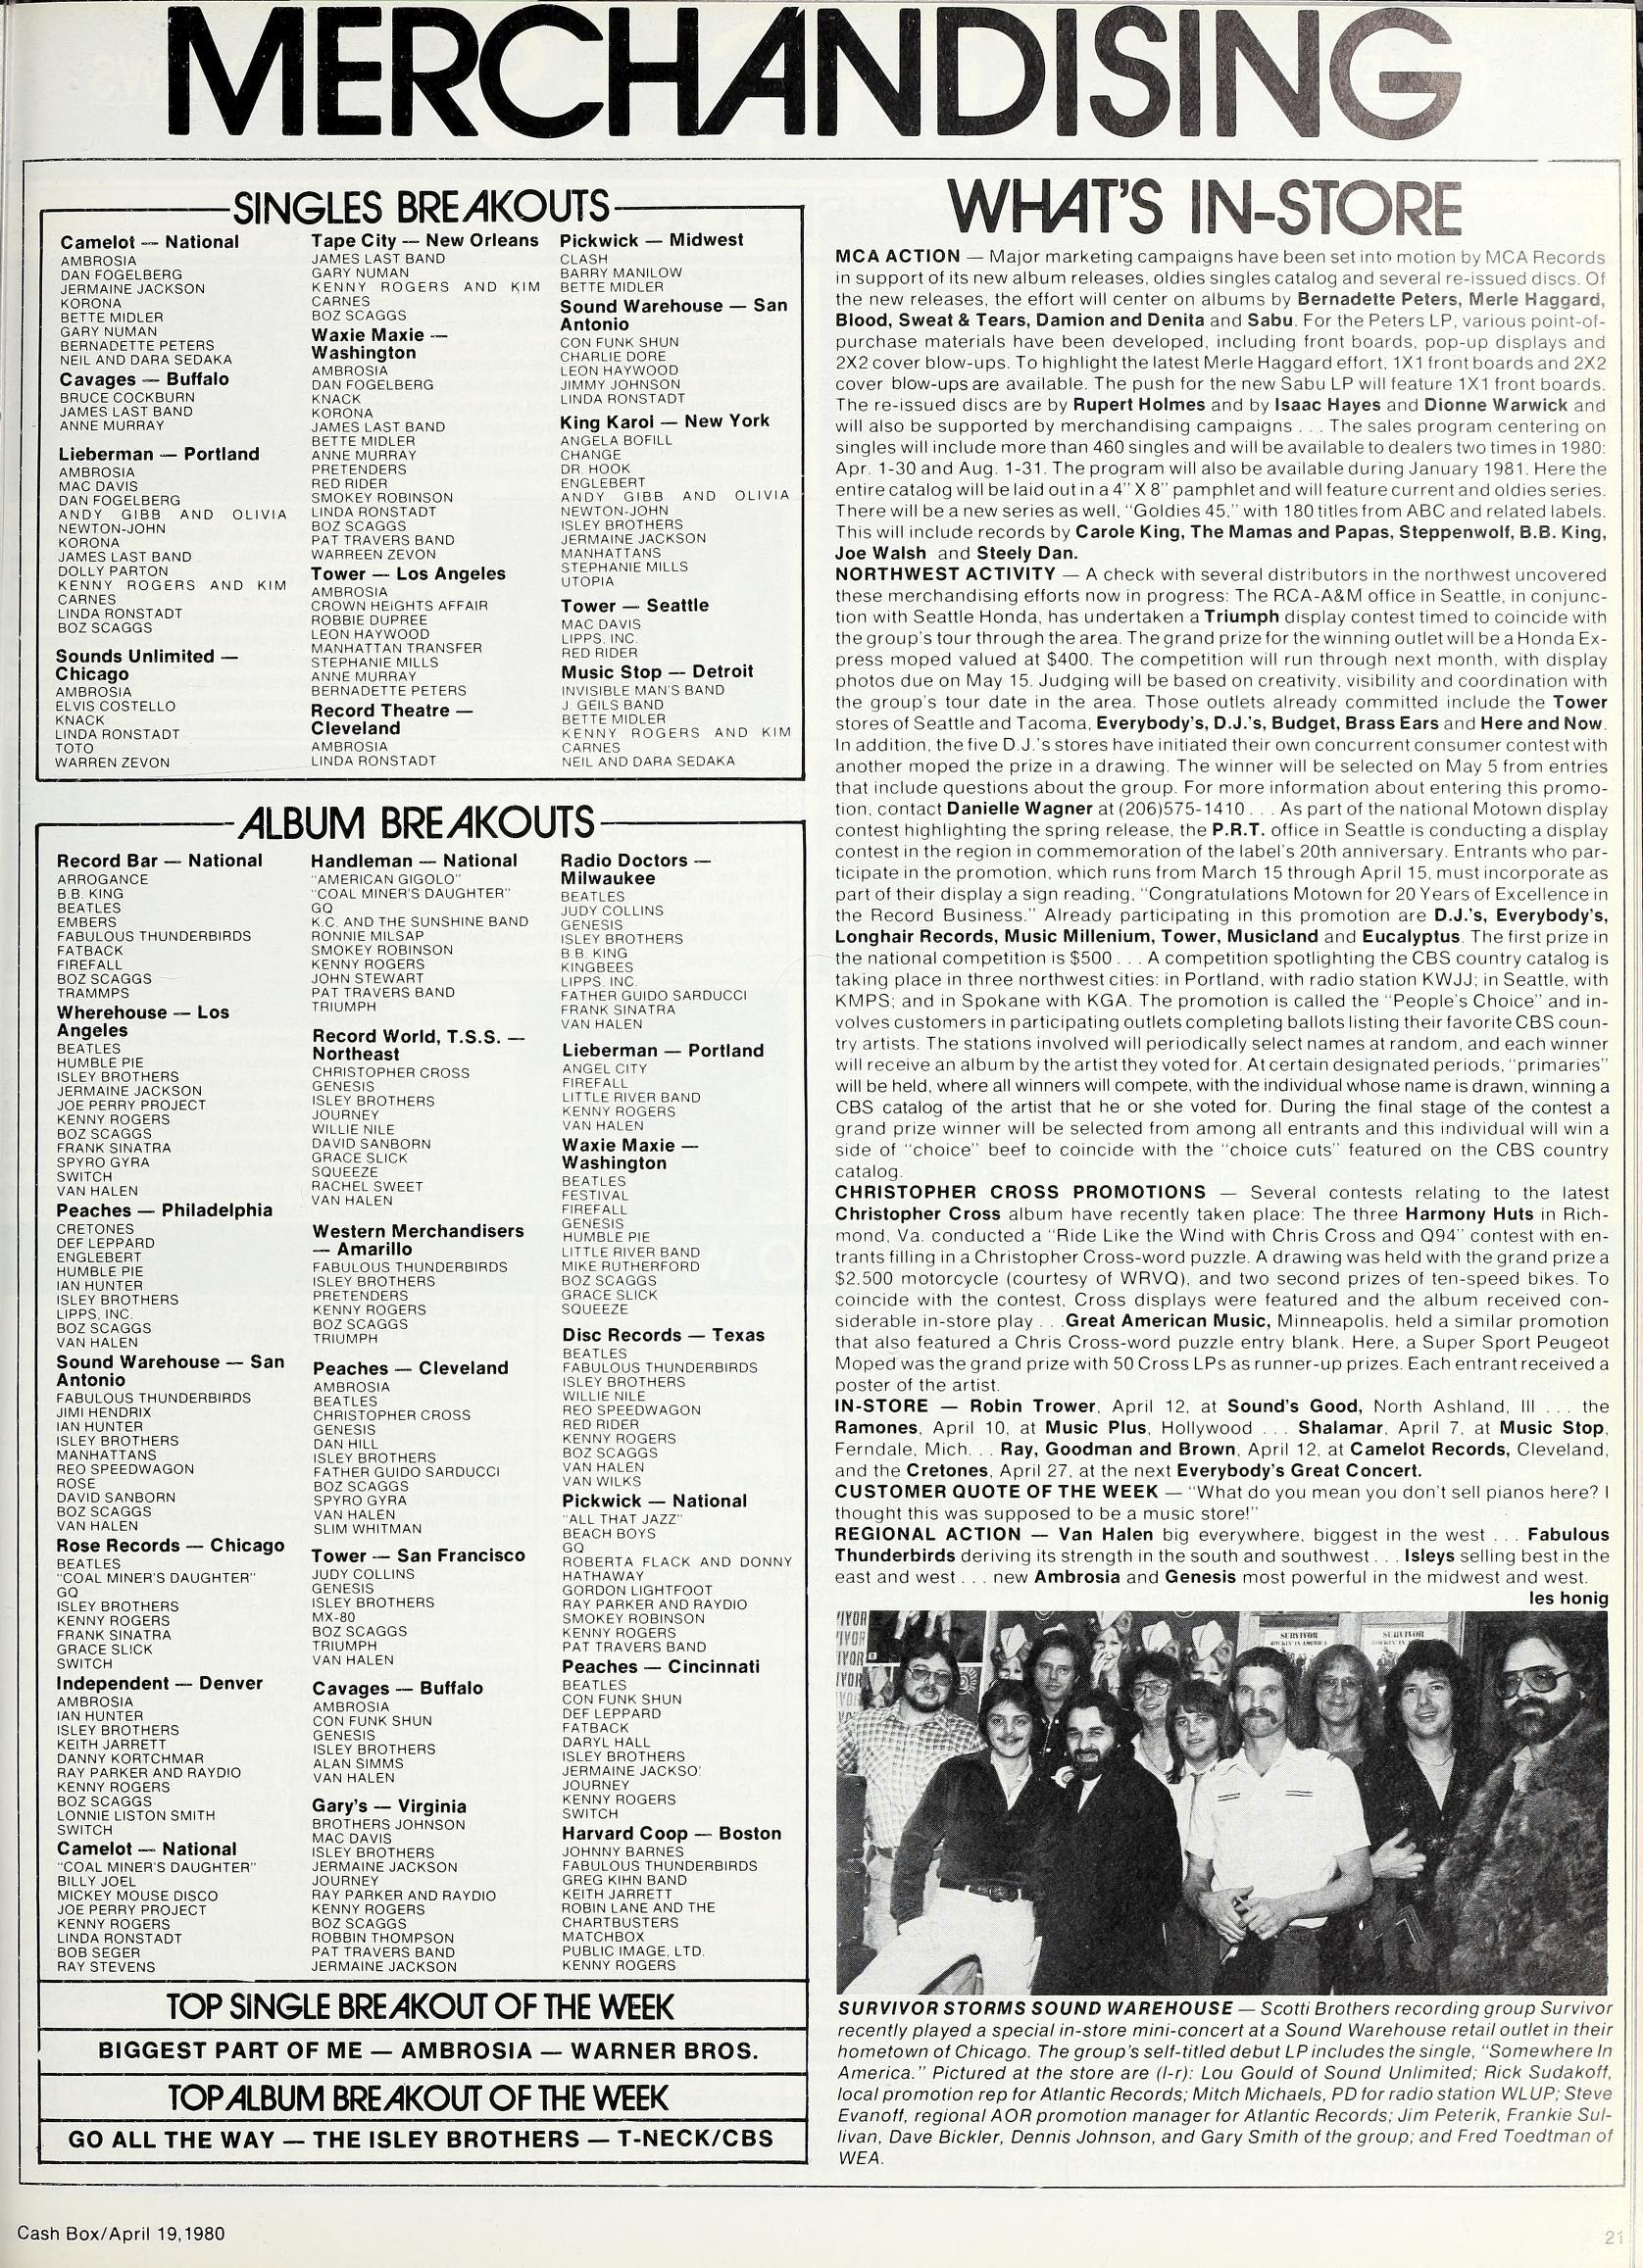 From the Jukebox to the Joystick: 'Cash Box' Magazine, 1980